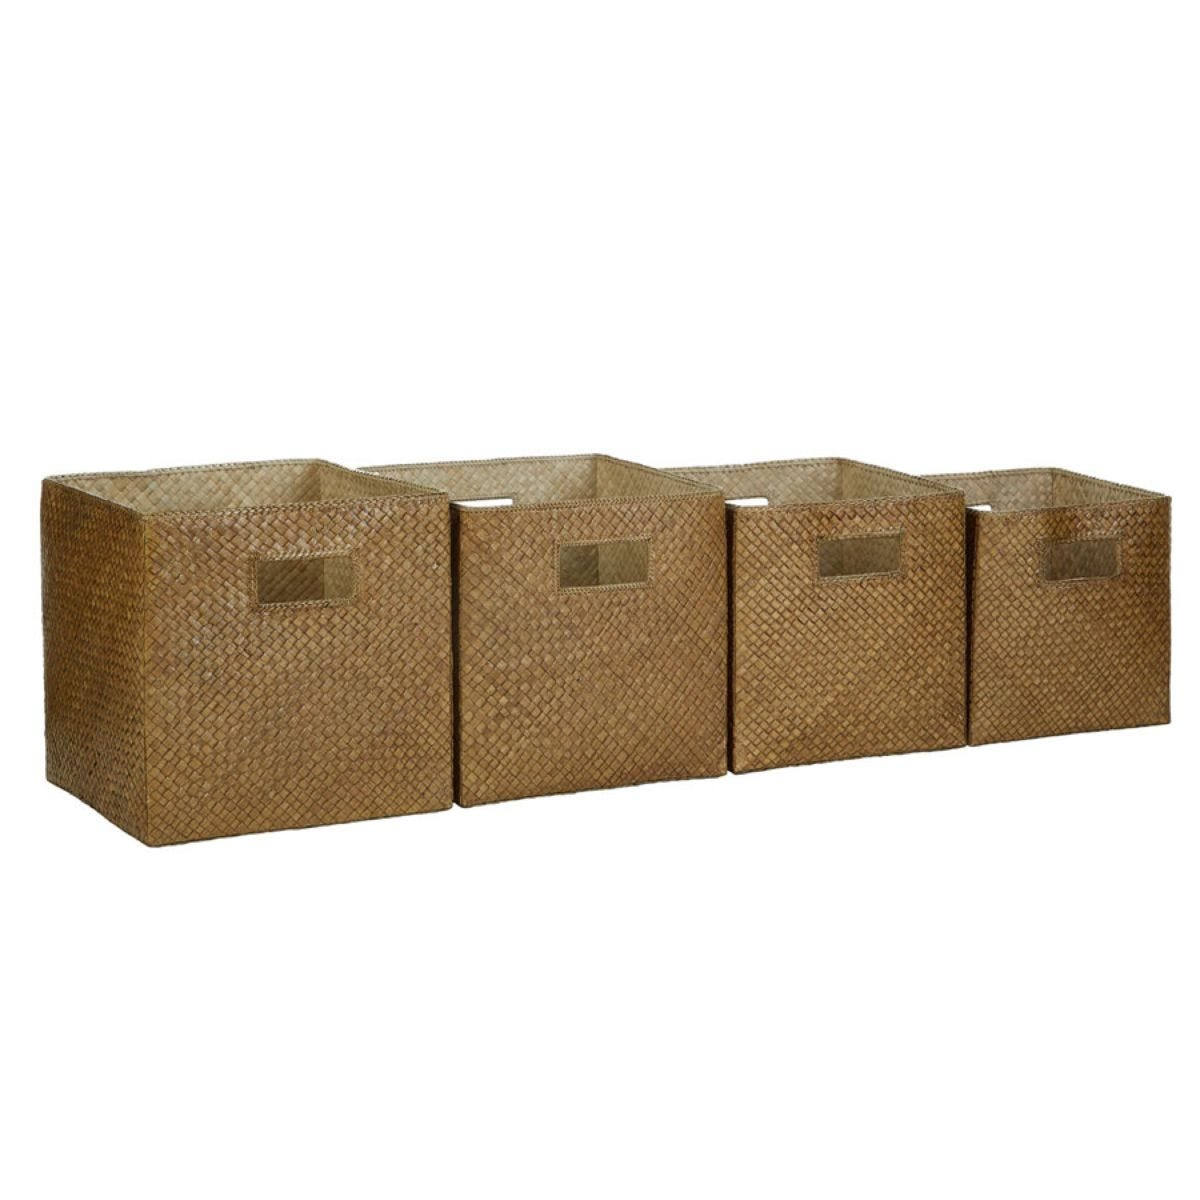 Premier Housewares Pandanus Set of 4 Storage Baskets - Antique Brown